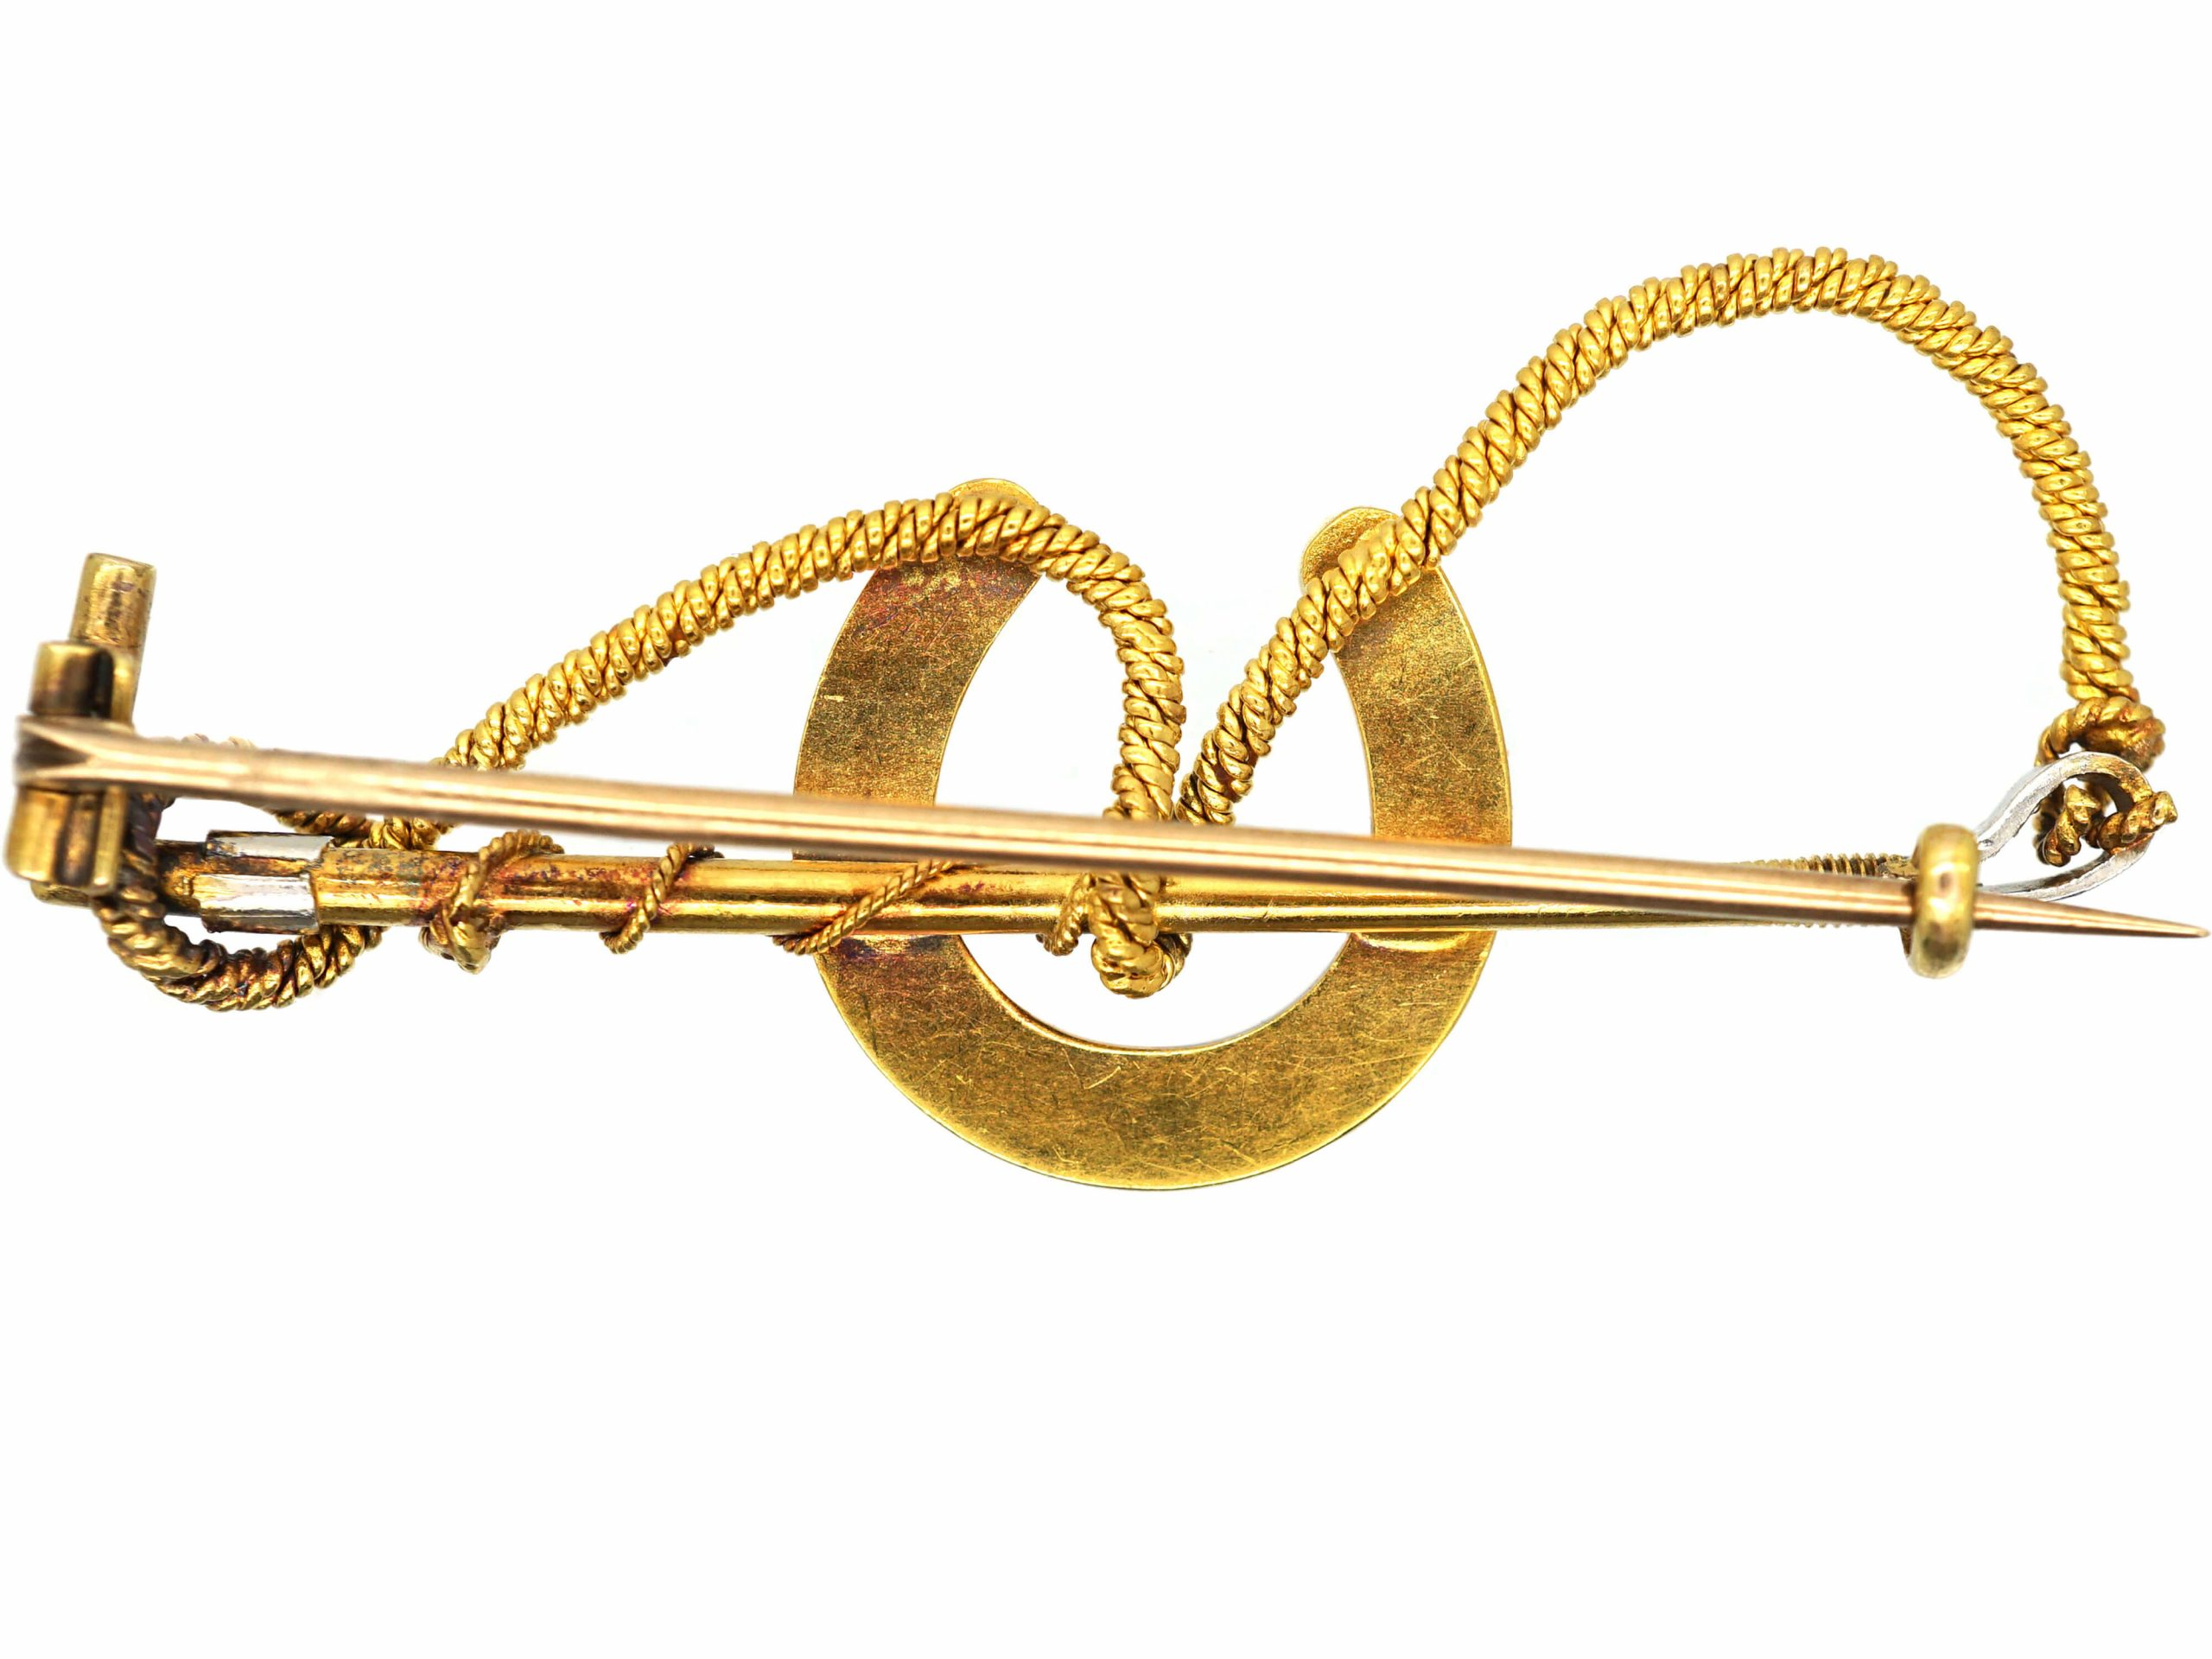 Edwardian 18ct Gold & Platinum, Riding Crop & Horseshoe Brooch set with Natural Split Pearls